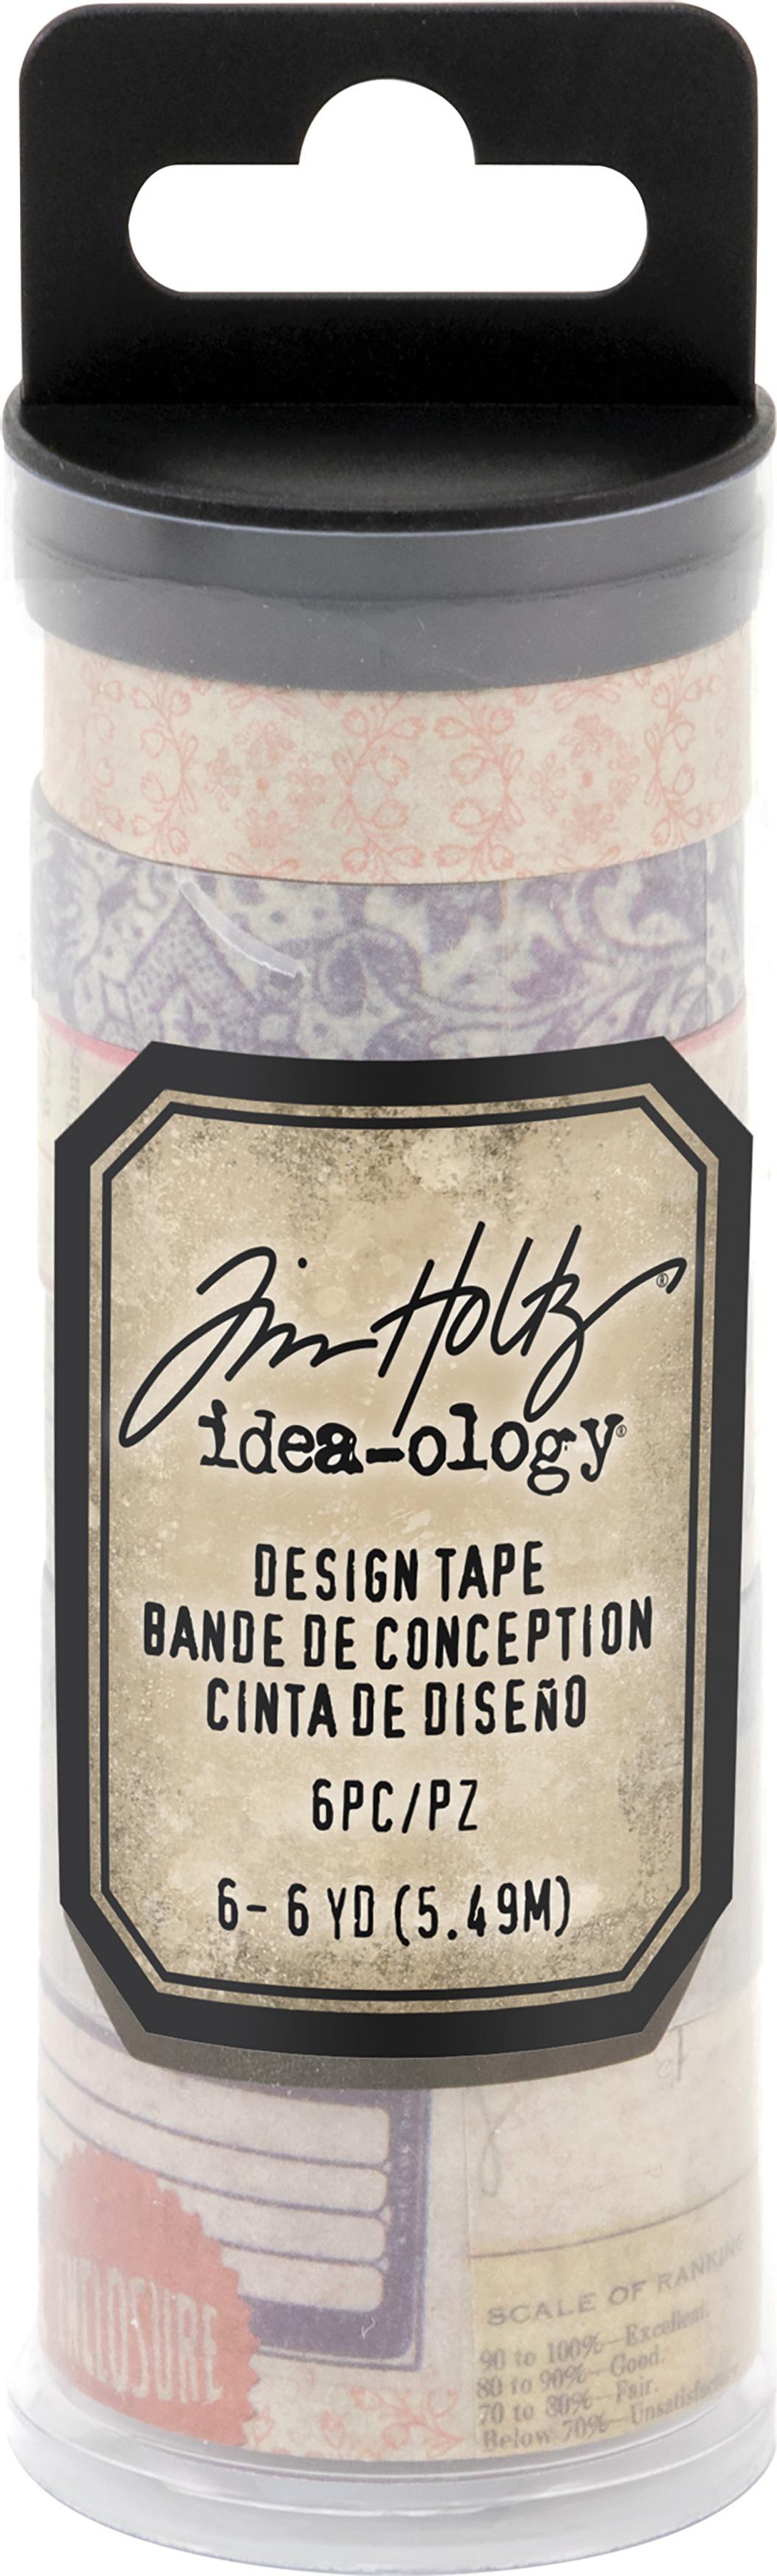 Design Tape - Merchant